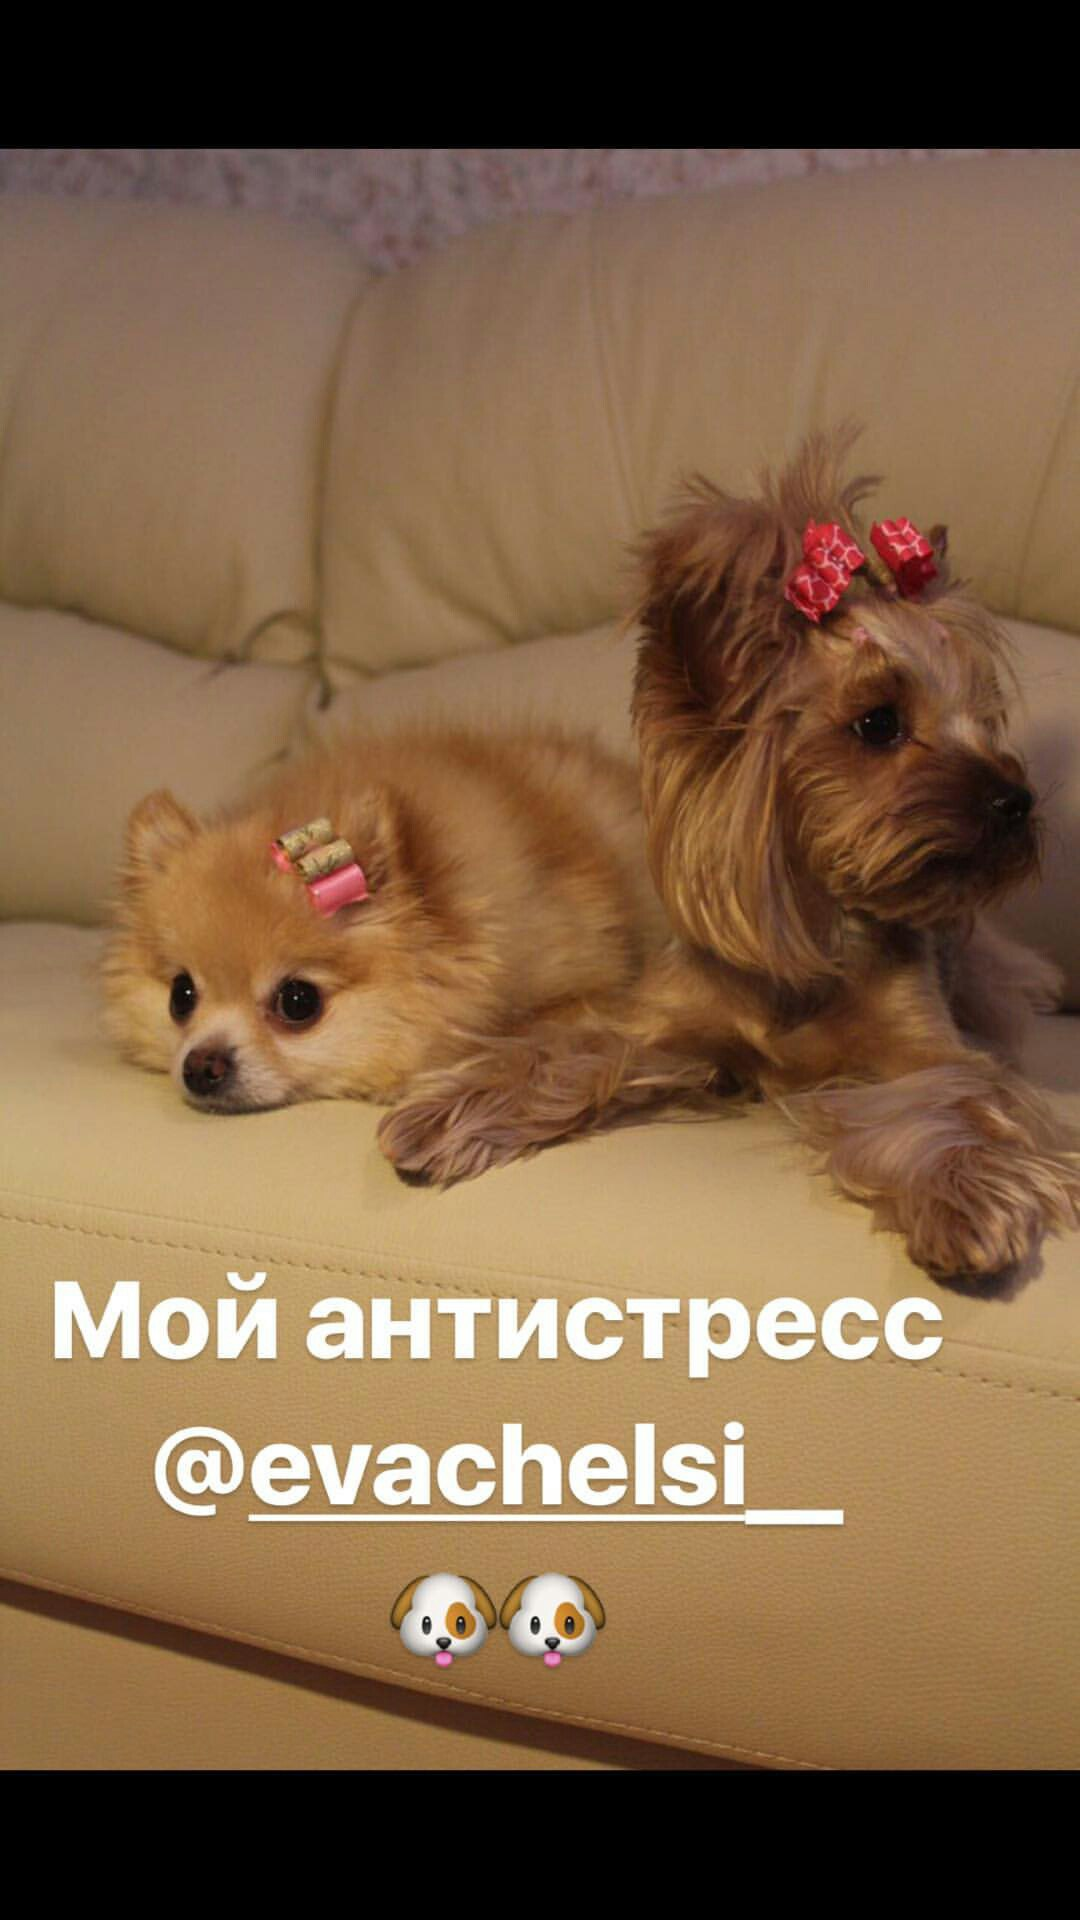 https://pp.userapi.com/c637422/v637422616/7a5b1/LBJluCx1CLI.jpg